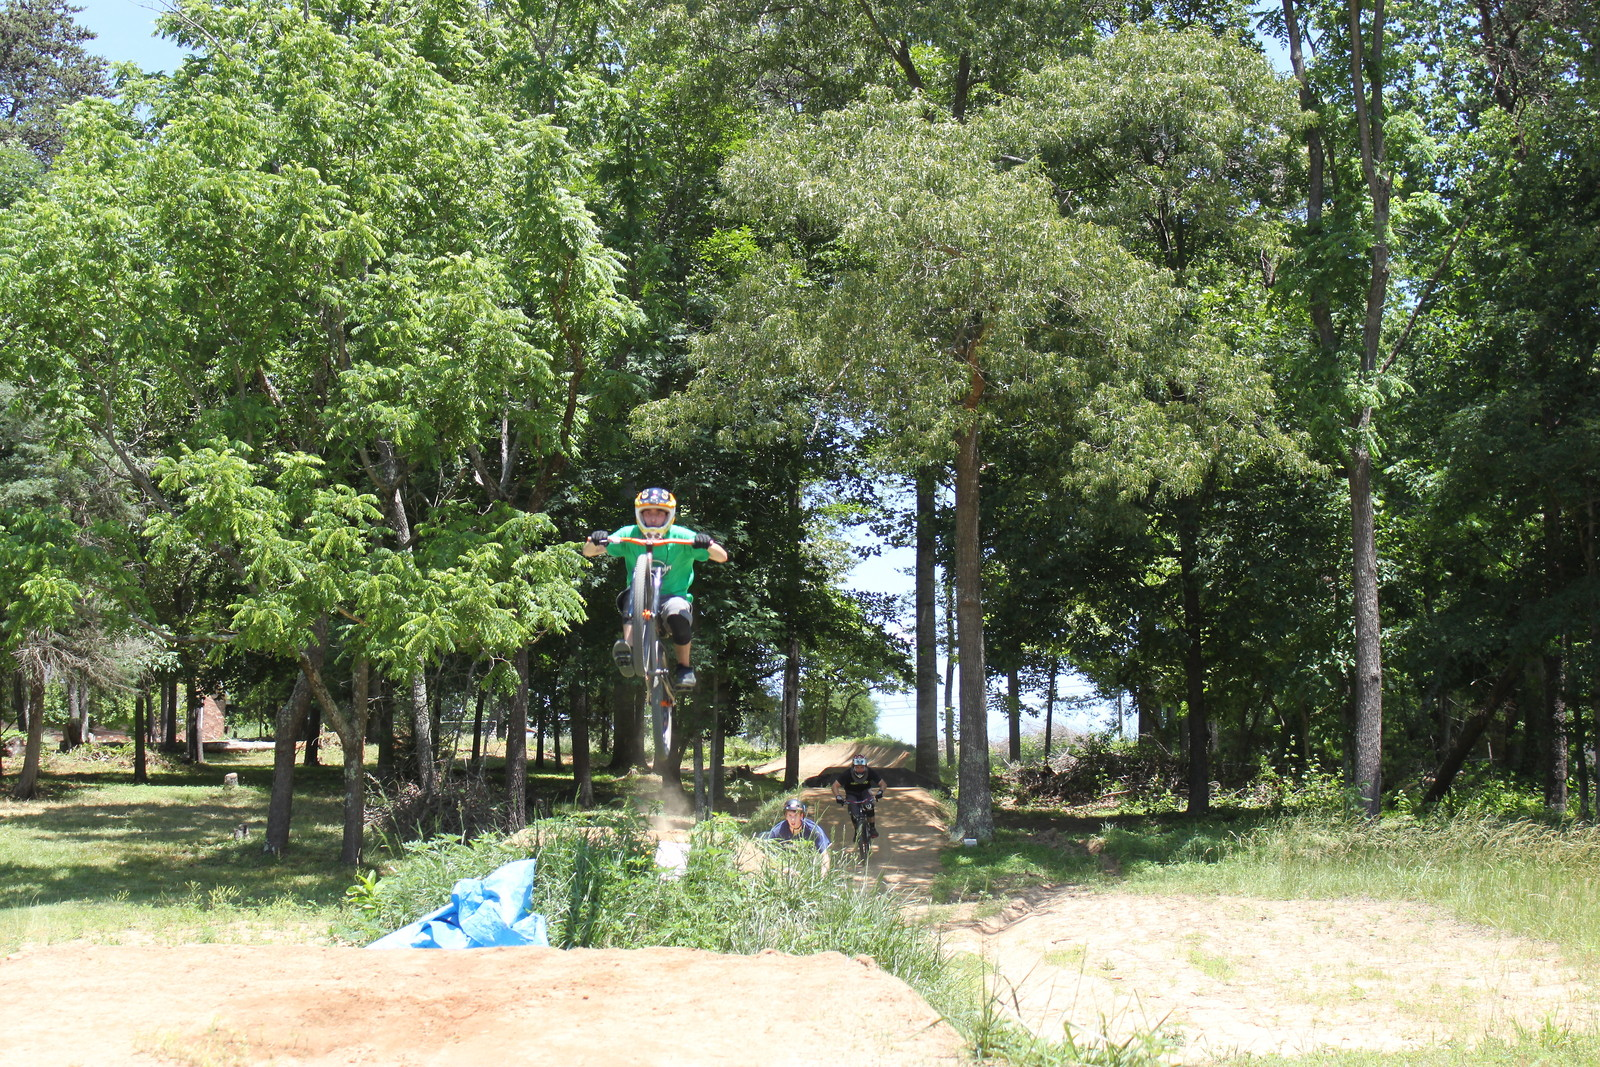 127 - speedbump - Mountain Biking Pictures - Vital MTB